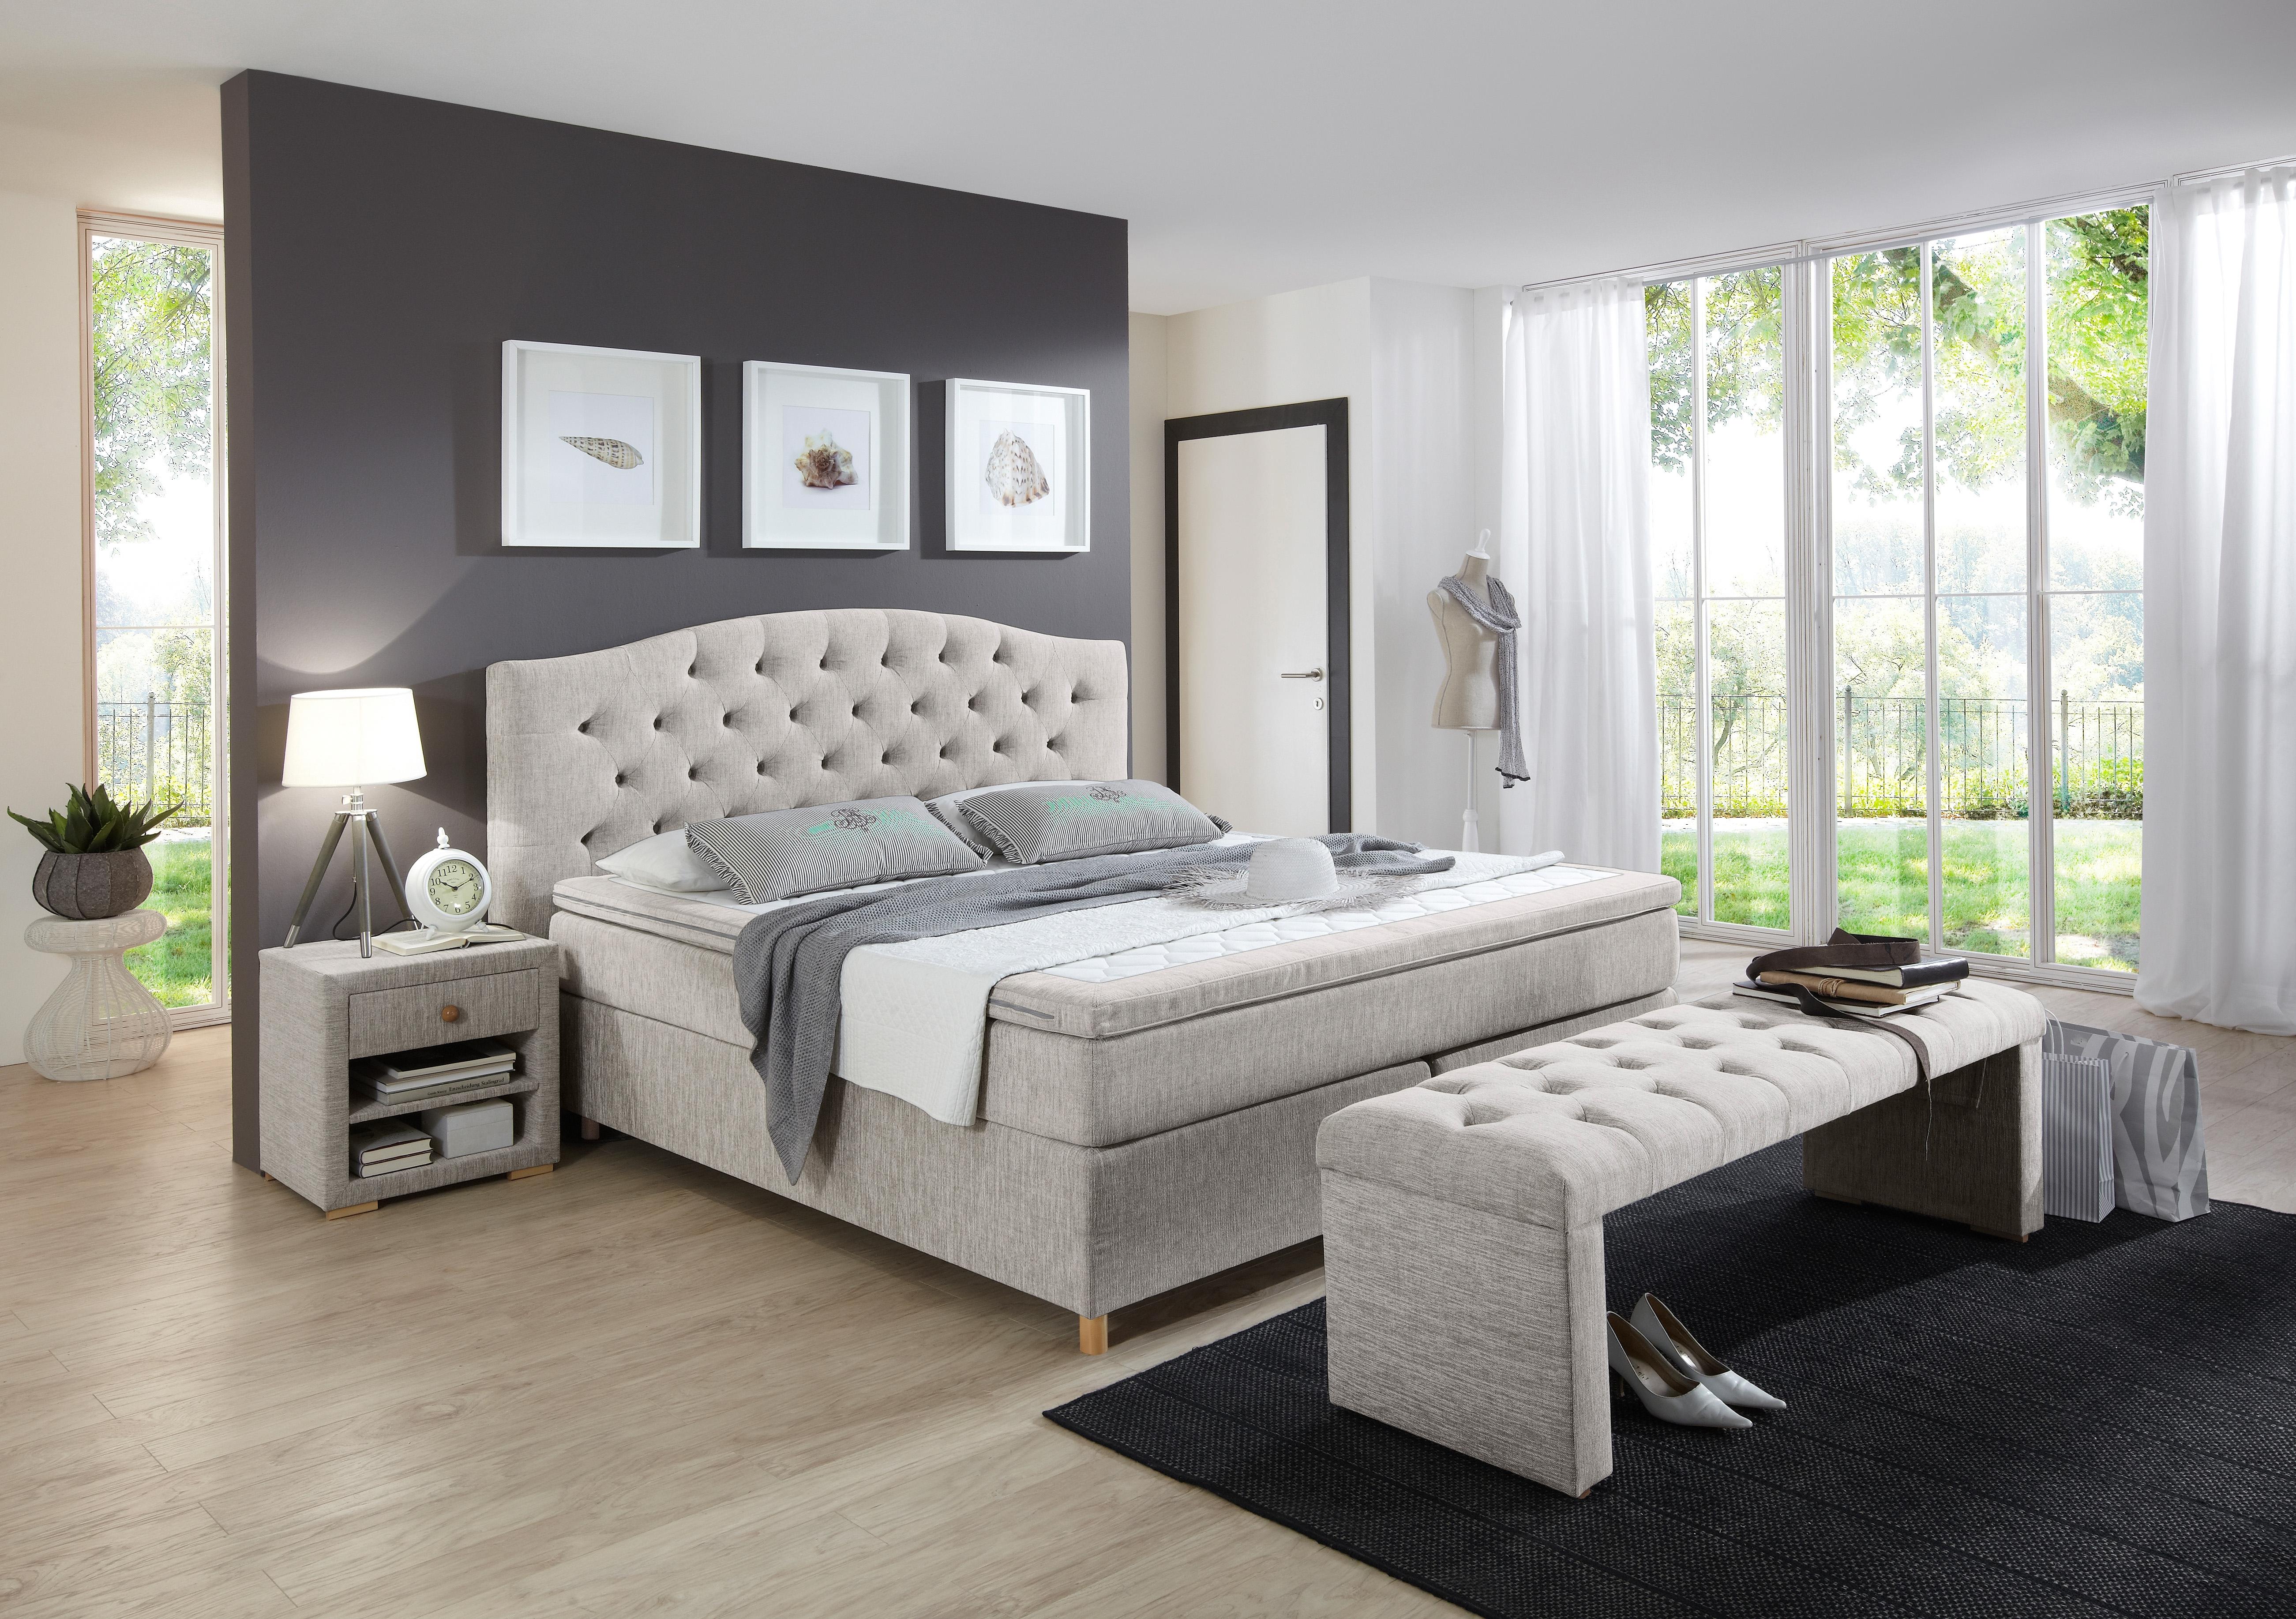 home affaire zitbank claire online verkrijgbaar otto. Black Bedroom Furniture Sets. Home Design Ideas